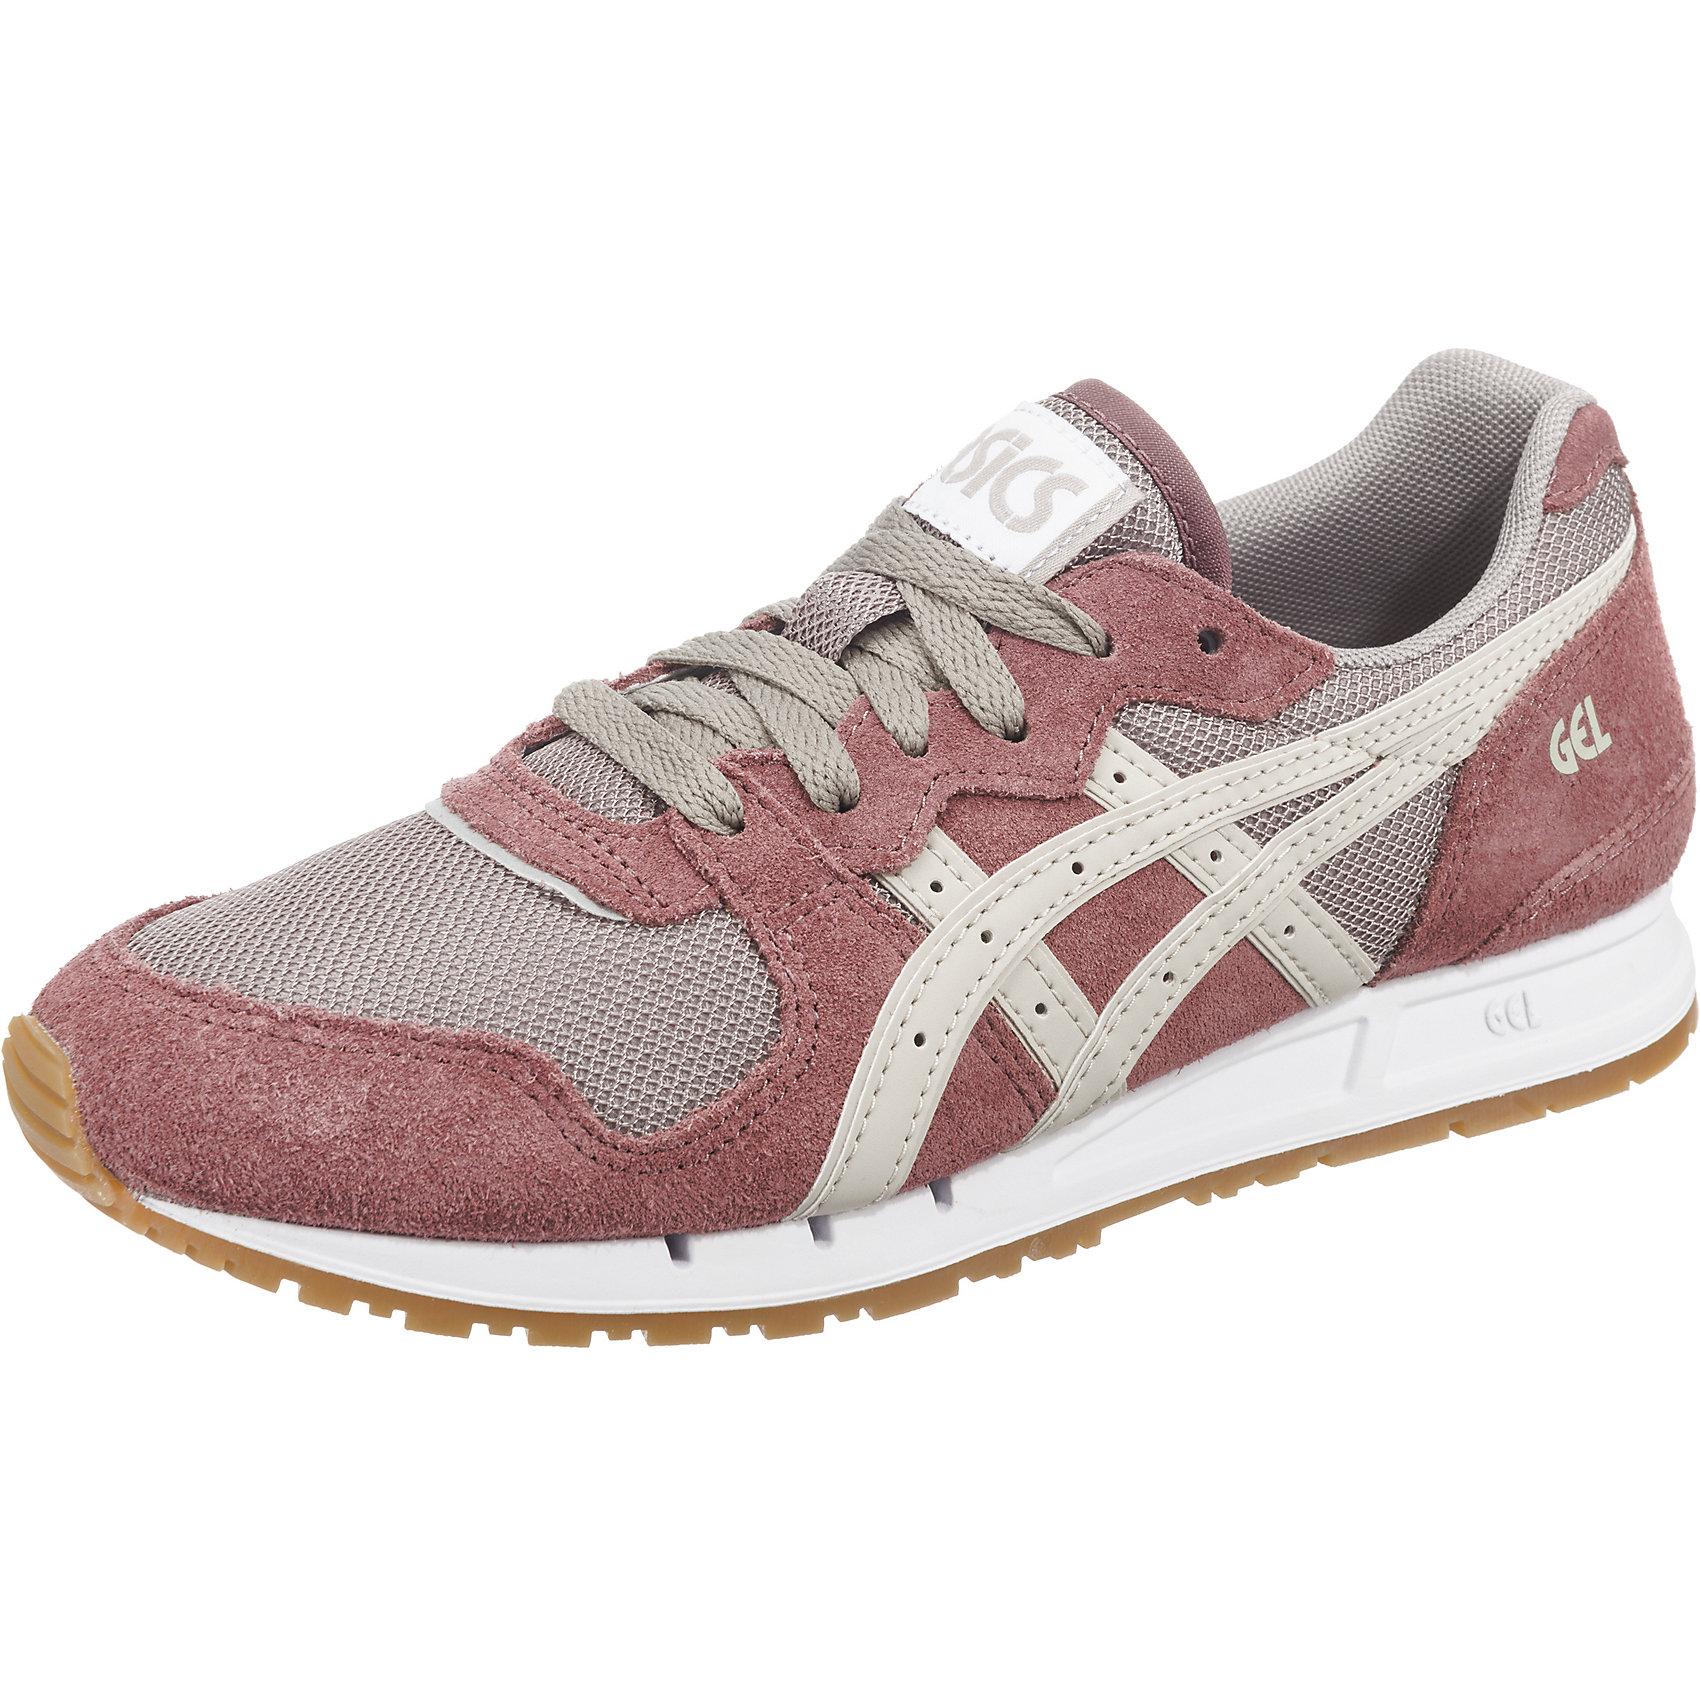 Neu ASICS Tiger GEL-MOVIMENTUM Sneakers Low 7381558 für Damen grau